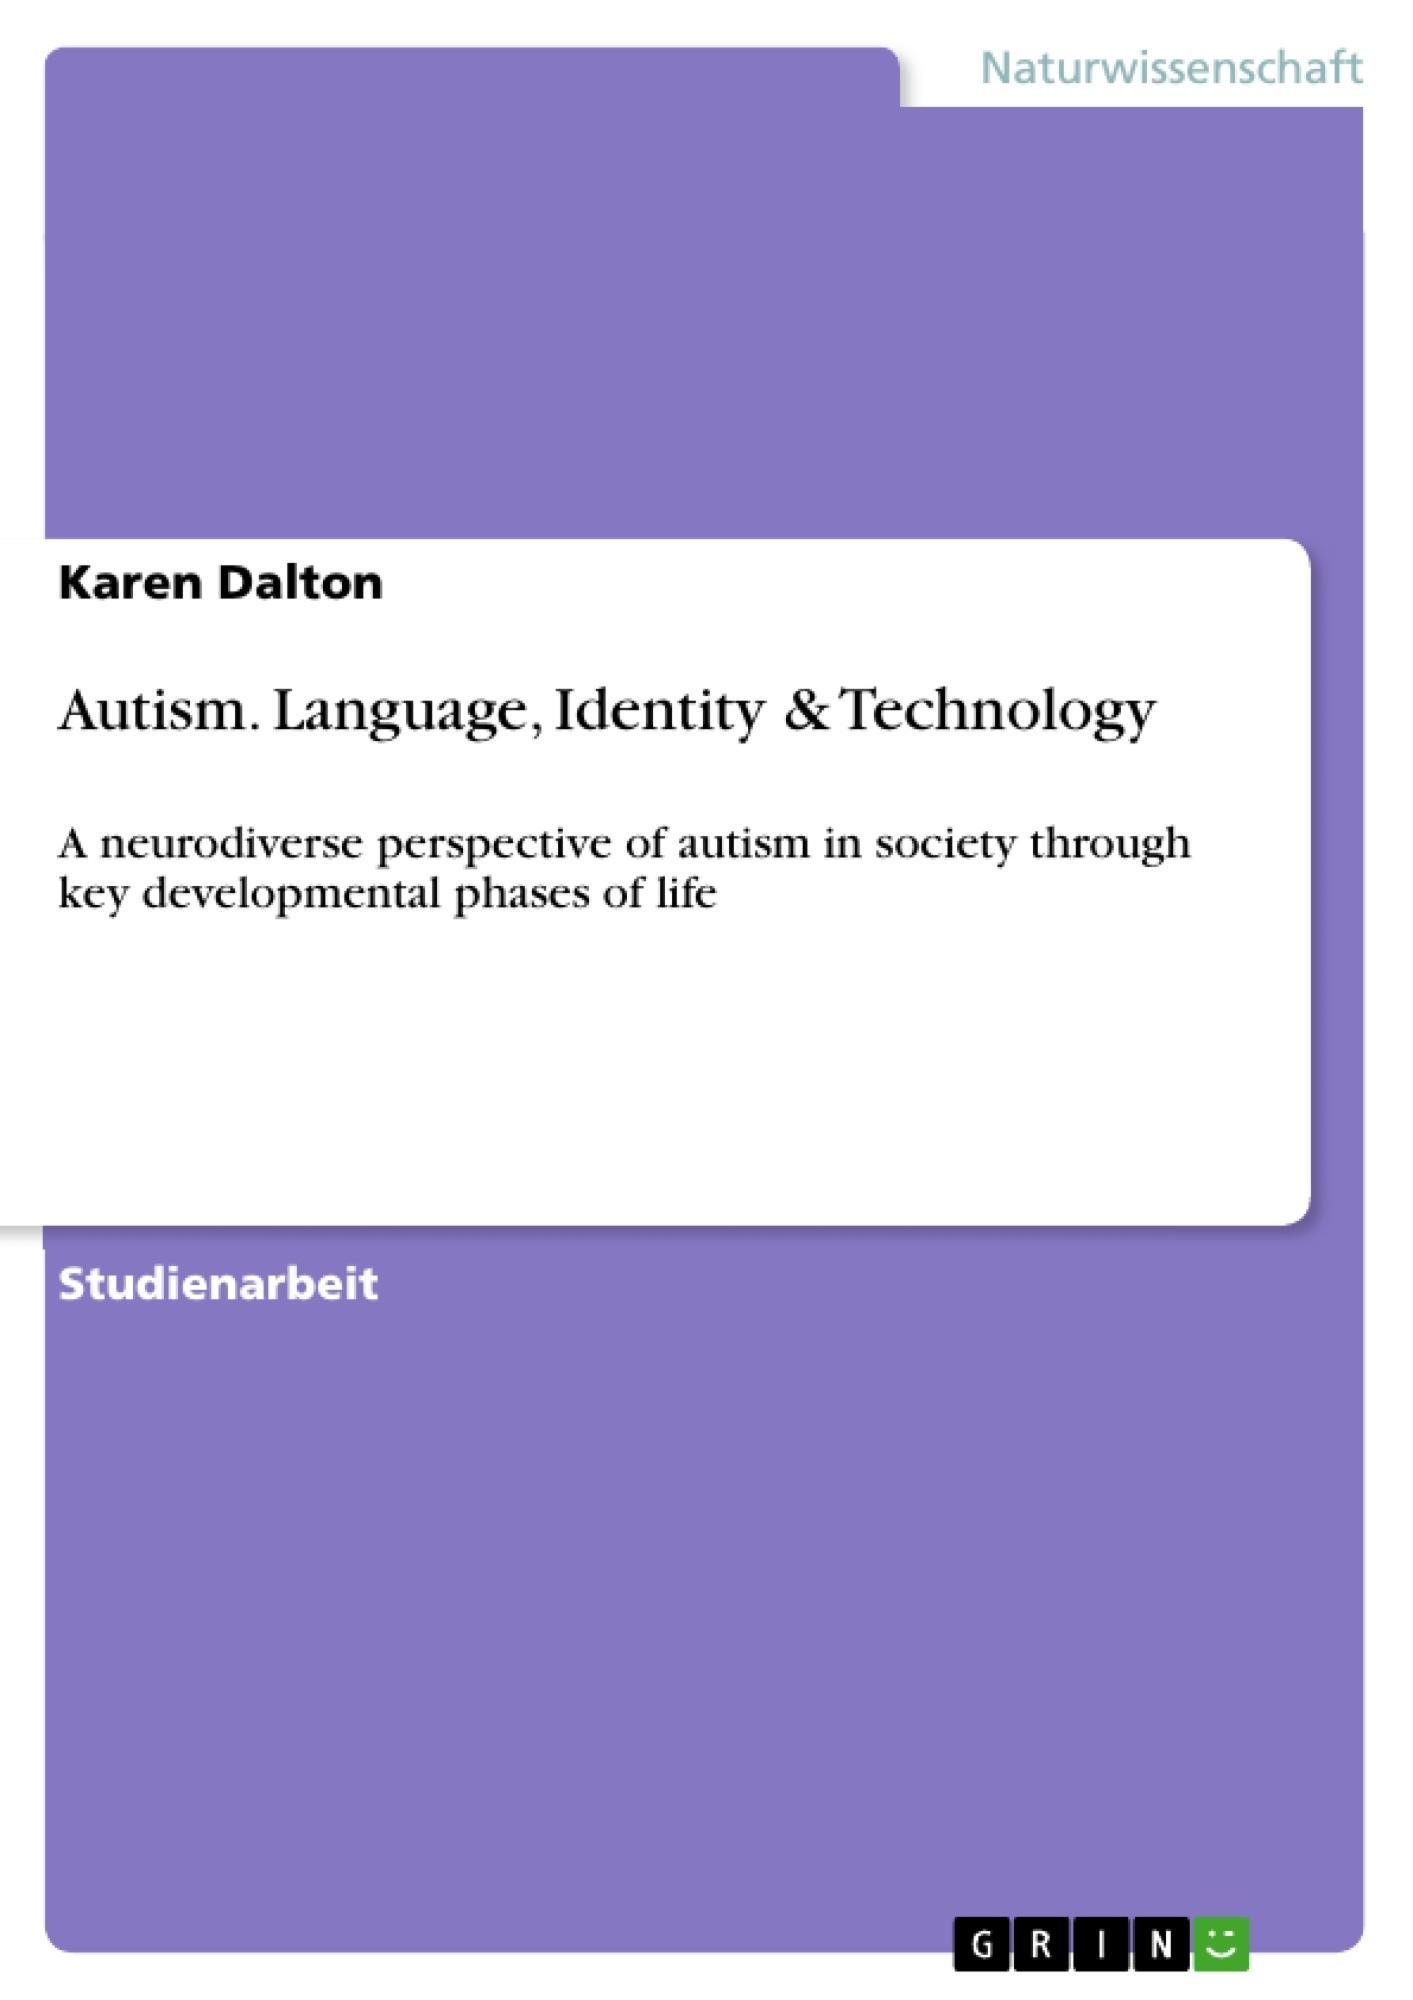 Titel: Autism. Language, Identity & Technology